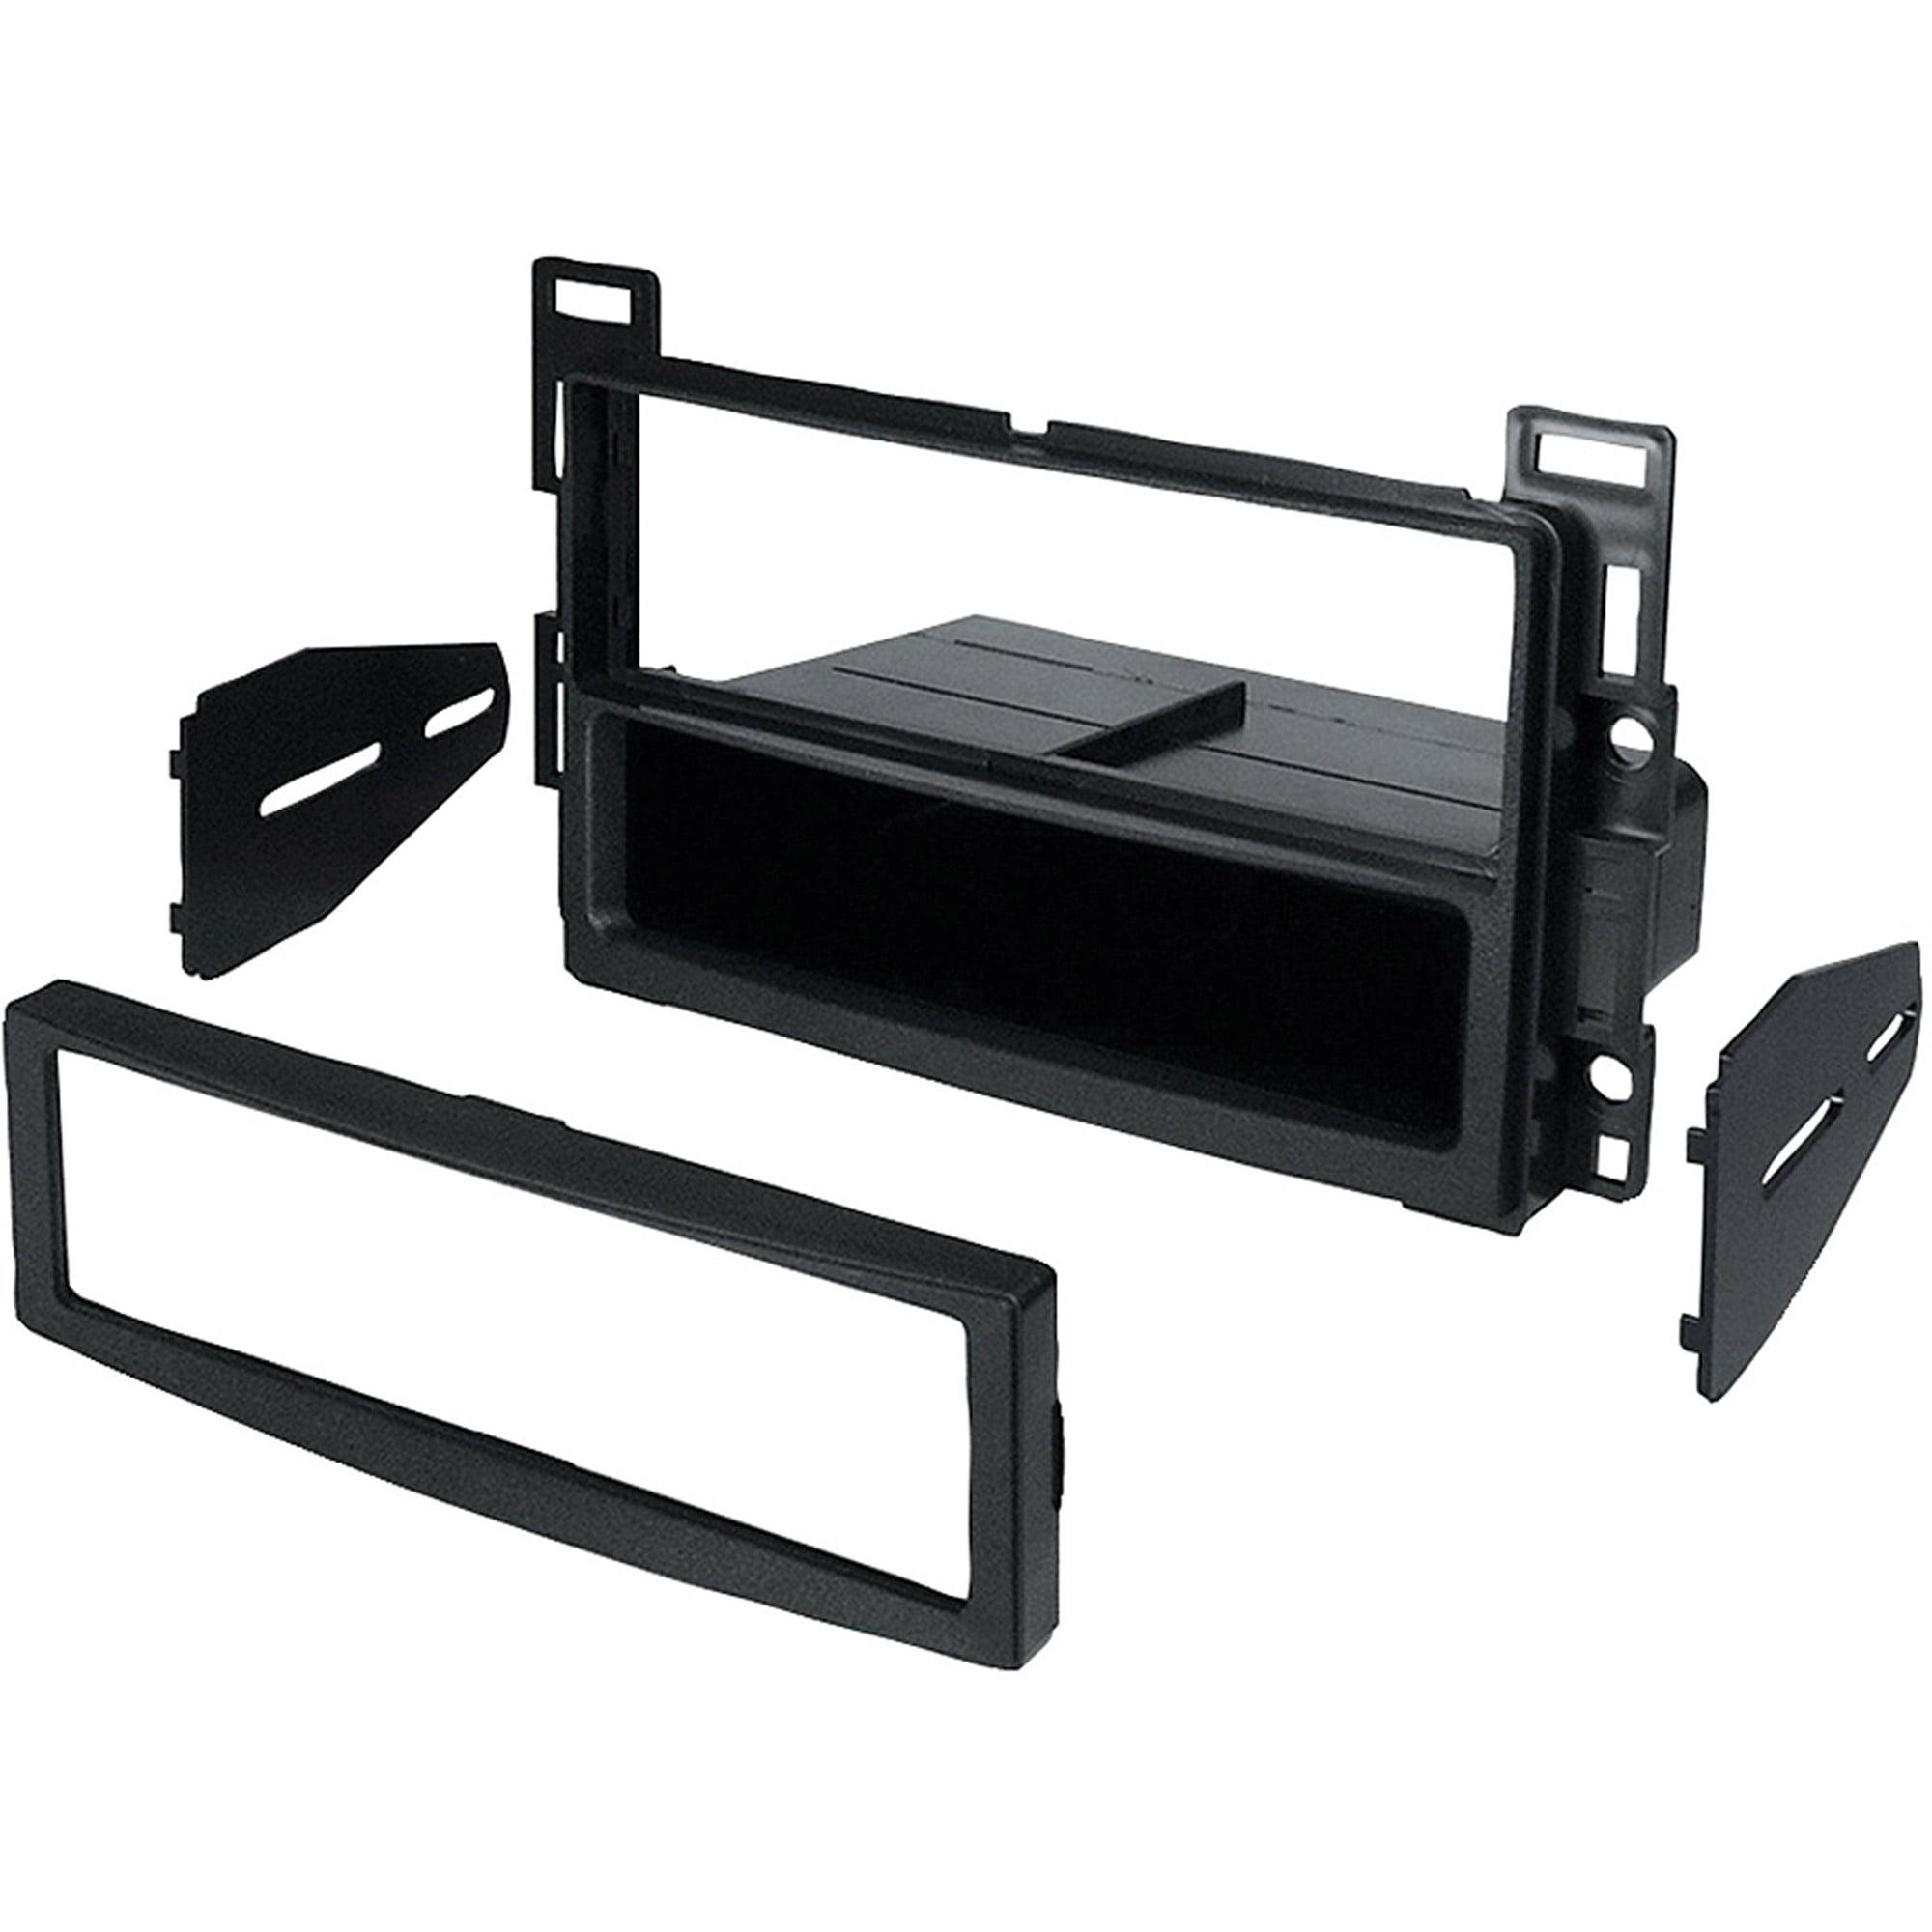 BEST KITS BKGMK350 In-Dash Installation Kit (Chevrolet(R)/Pontiac(R) (Malibu, Ma